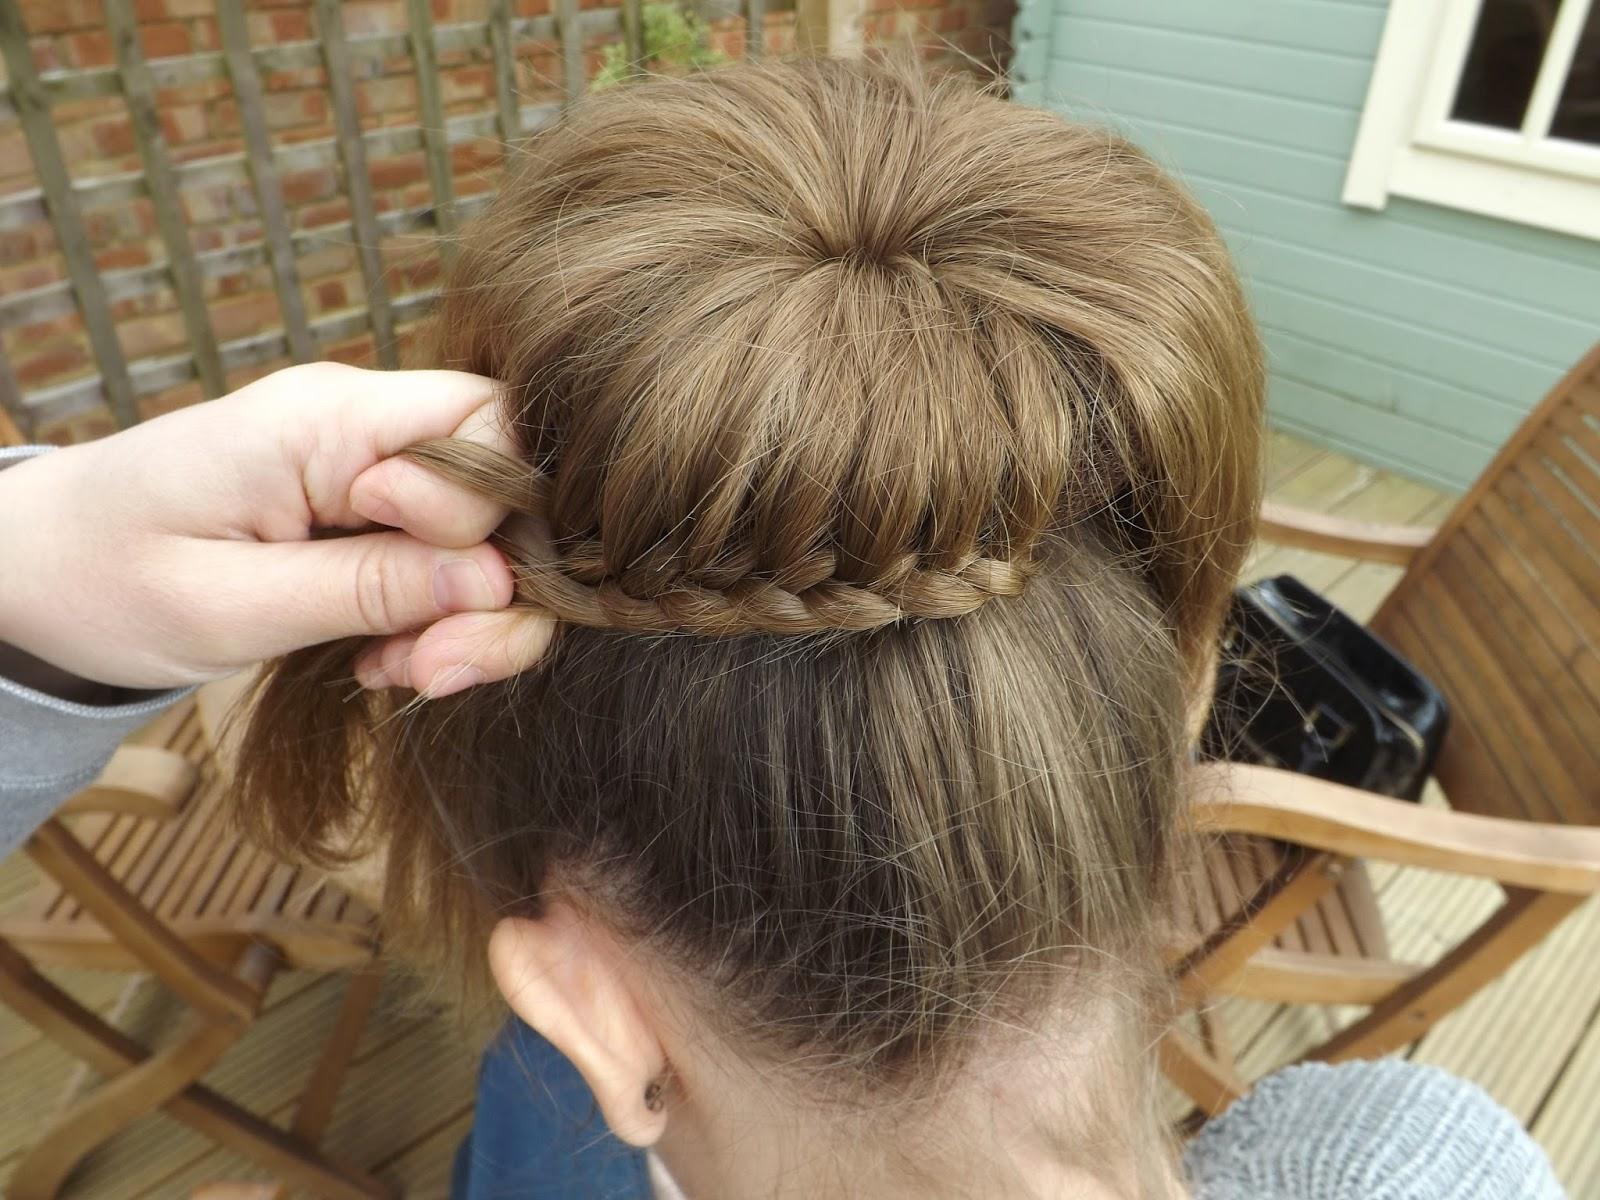 Hair Tutorial: How to do a French Braided Bun - Lottie Pearce